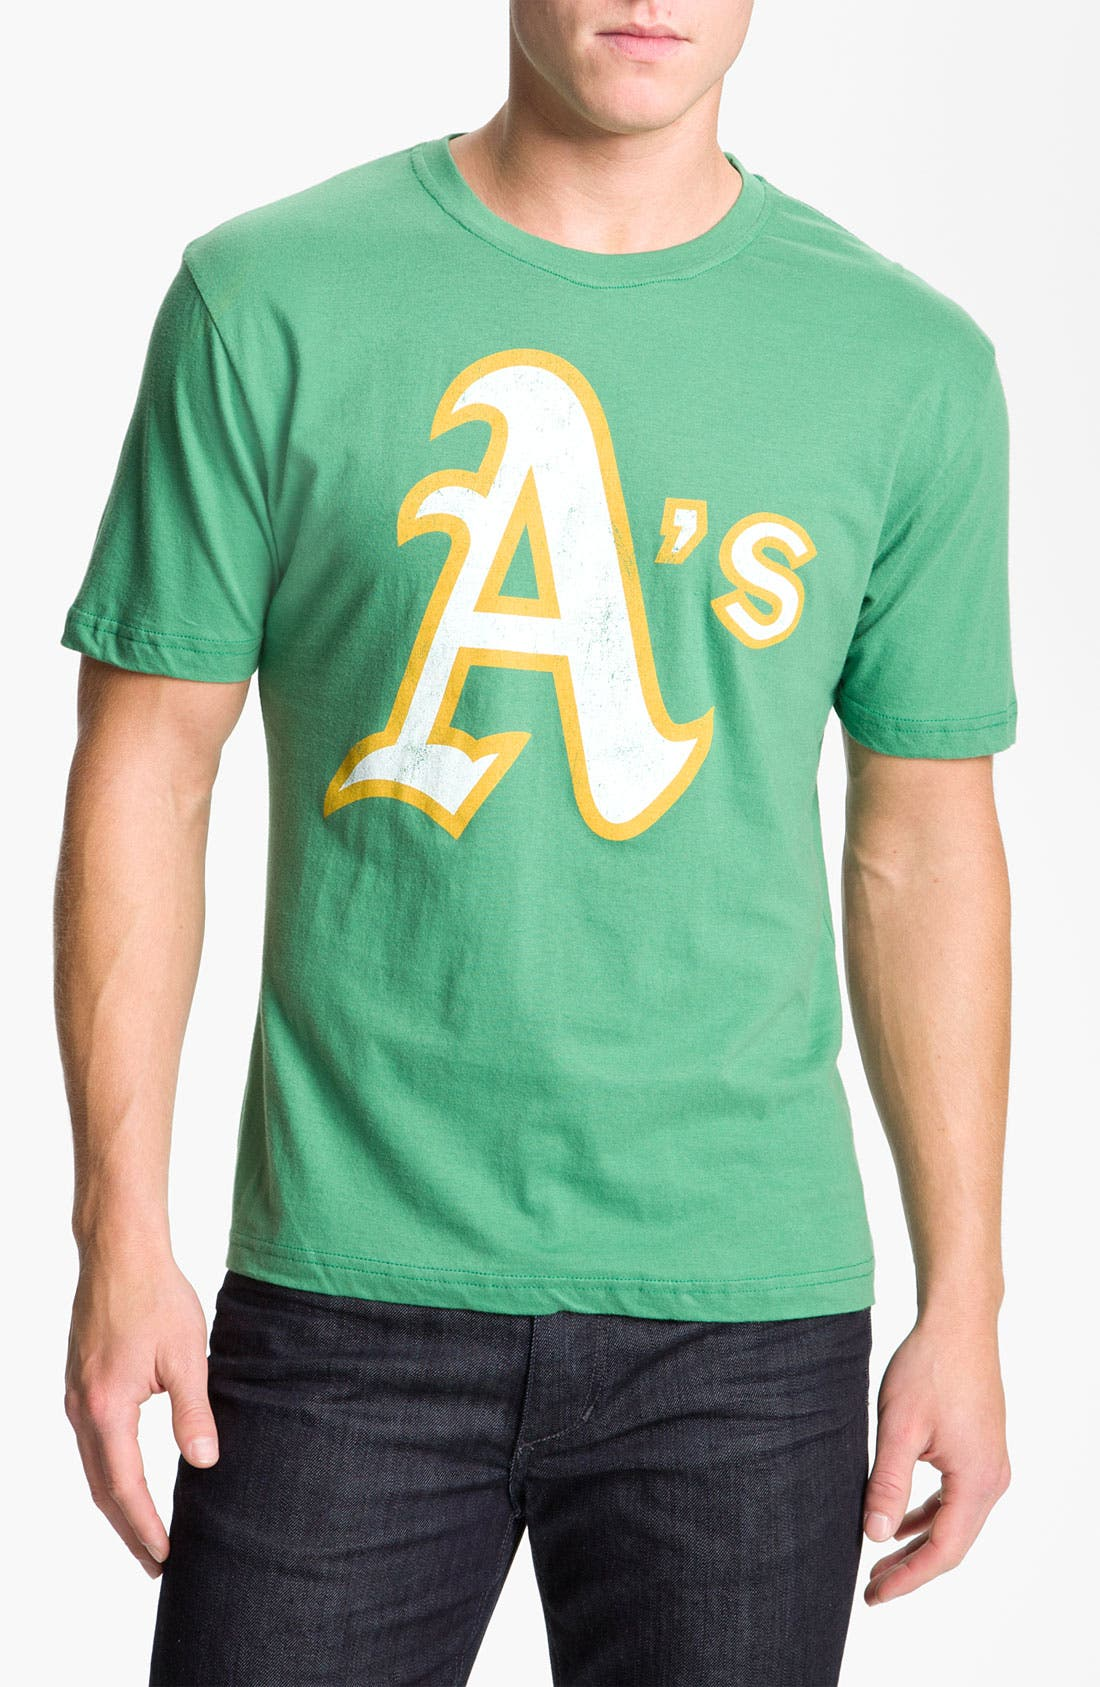 Alternate Image 1 Selected - Wright & Ditson 'Oakland Athletics' Graphic T-Shirt